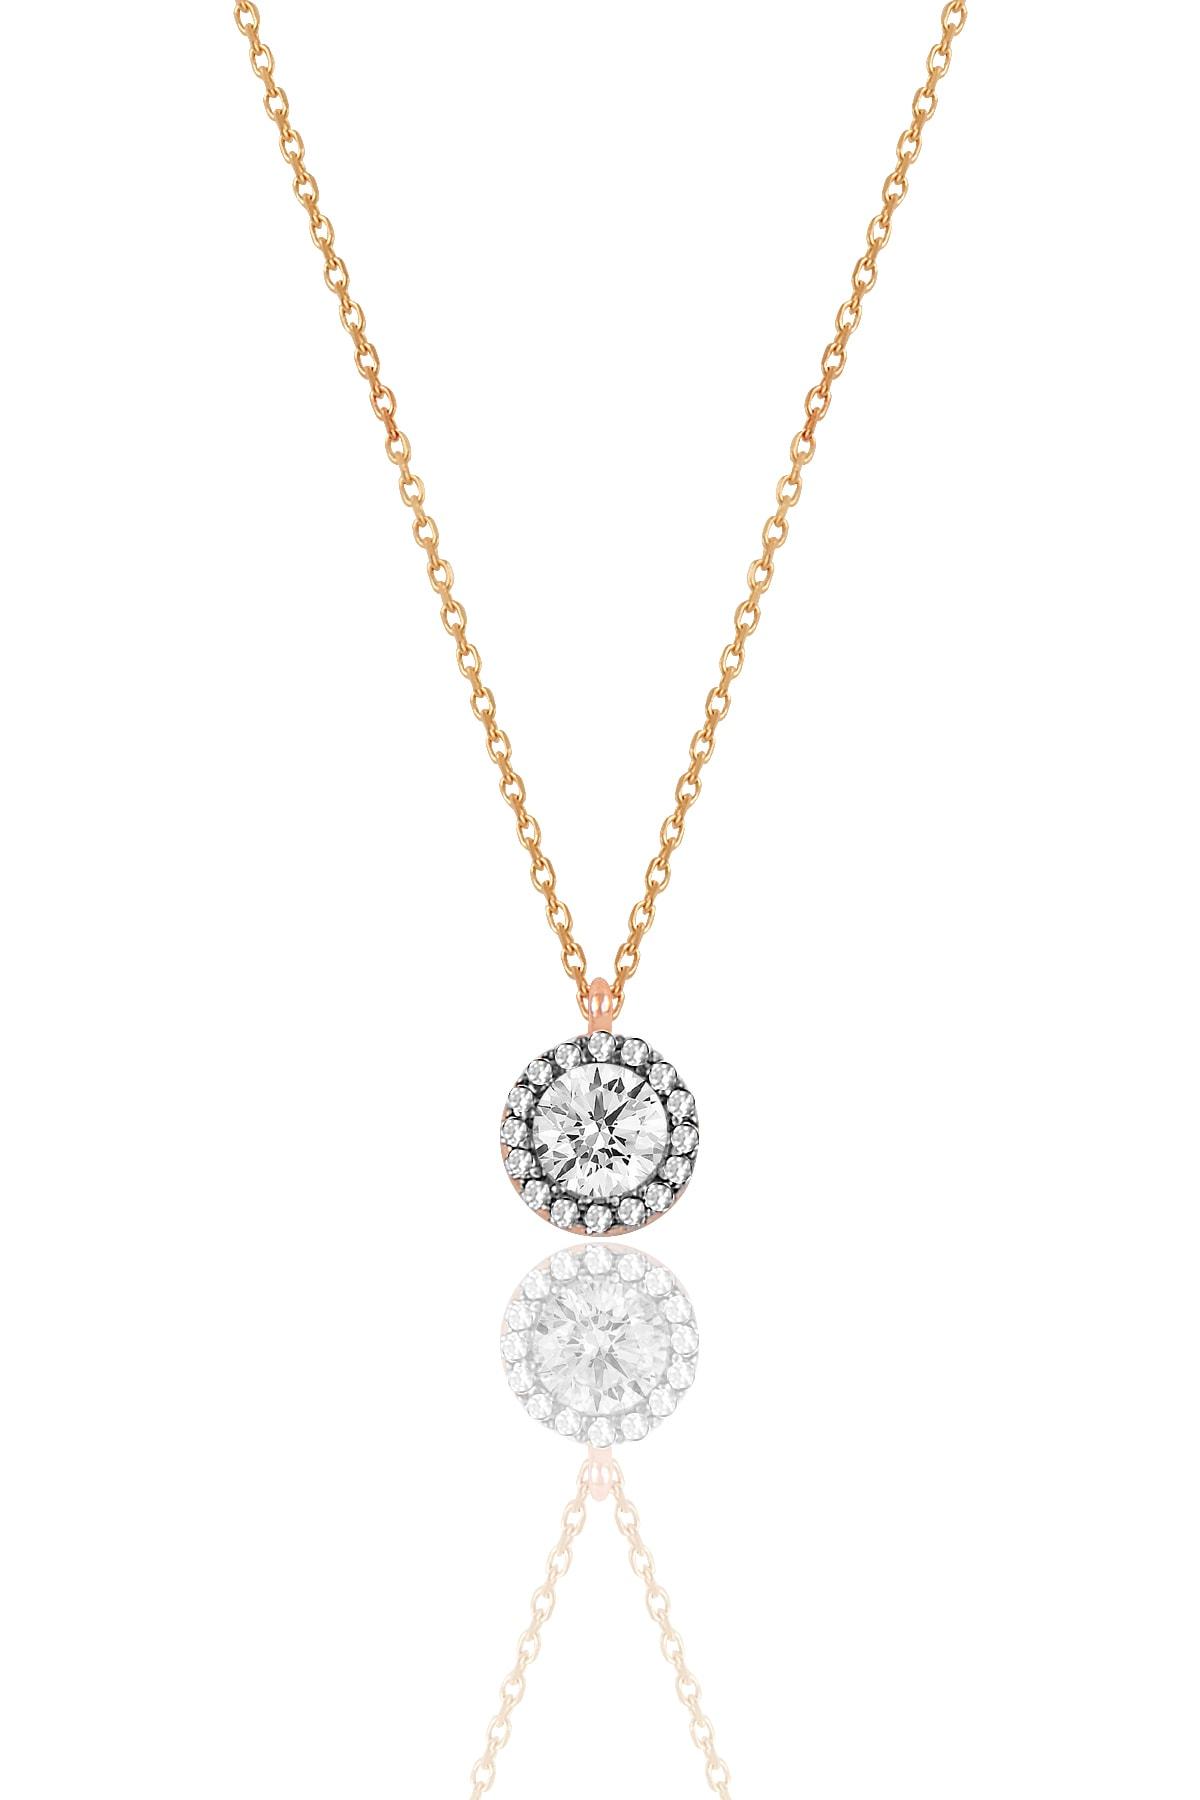 Söğütlü Silver Kadın Gümüş  Elmas Montürlü Tek Taş Kolye SGTL9907 1